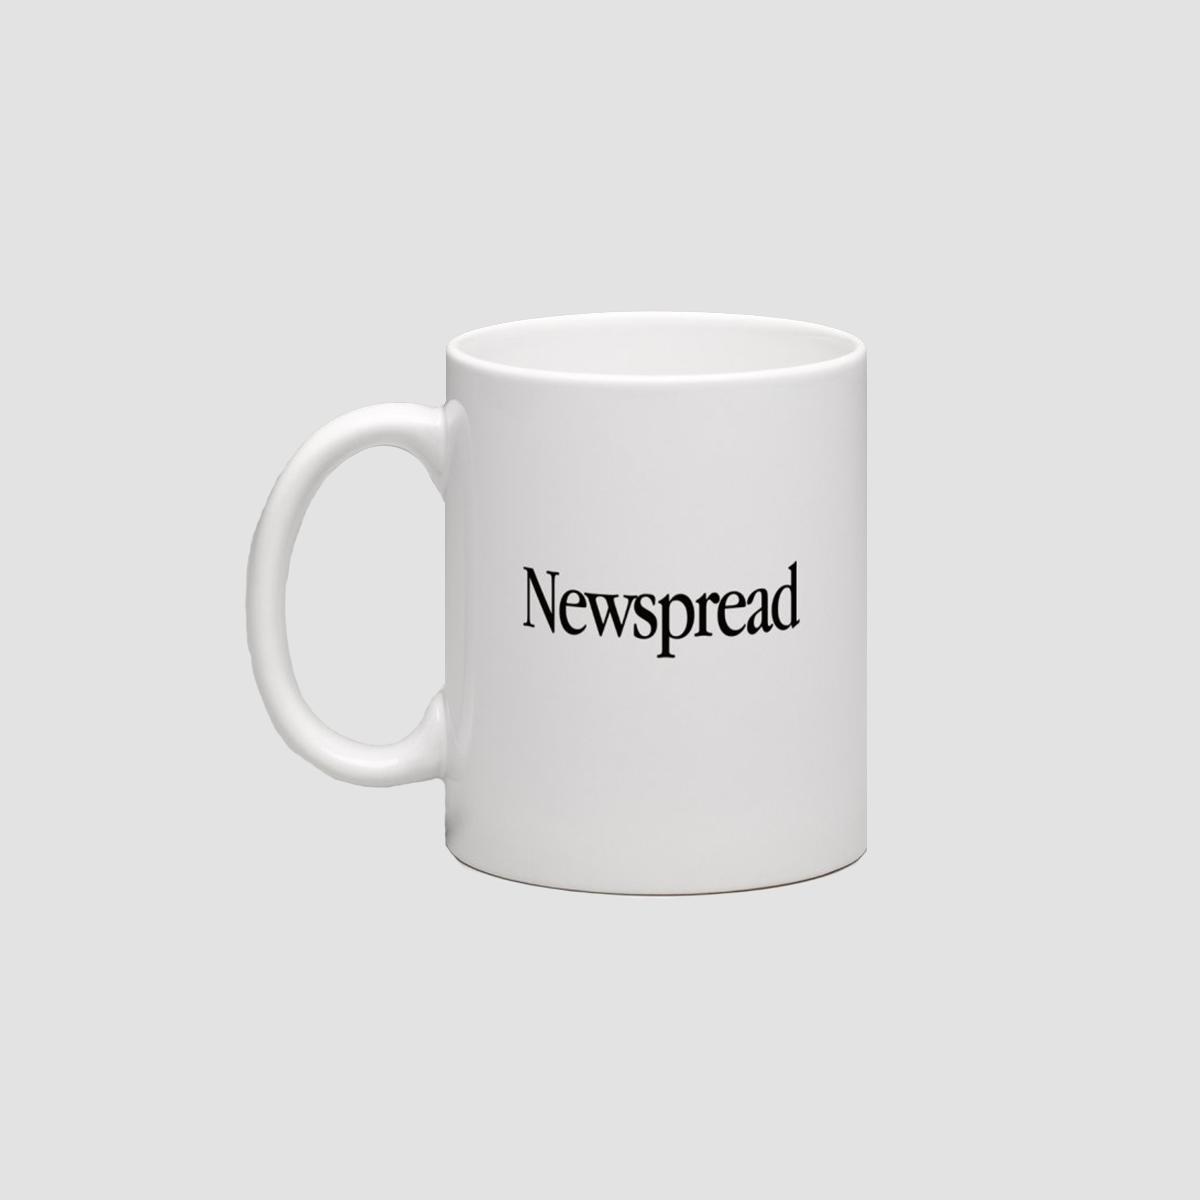 Newspread_Garamond_Mug01.jpg